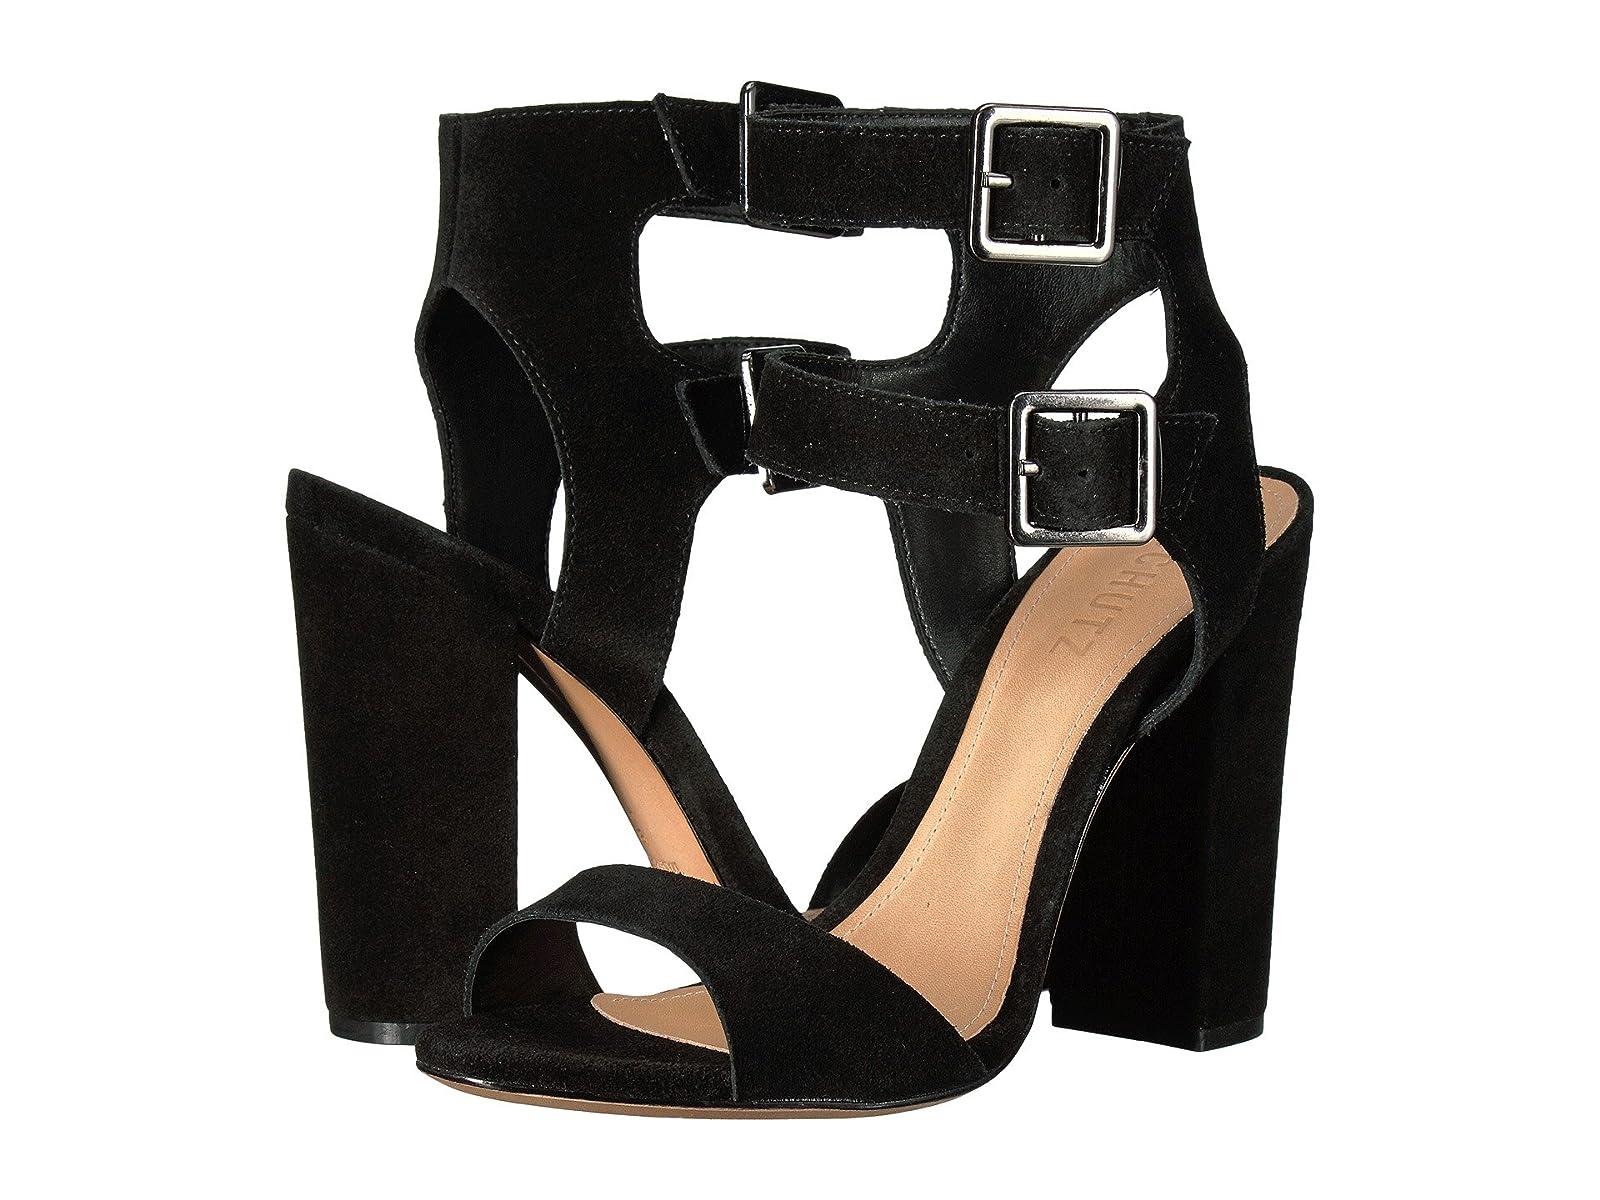 Schutz MahaganyCheap and distinctive eye-catching shoes